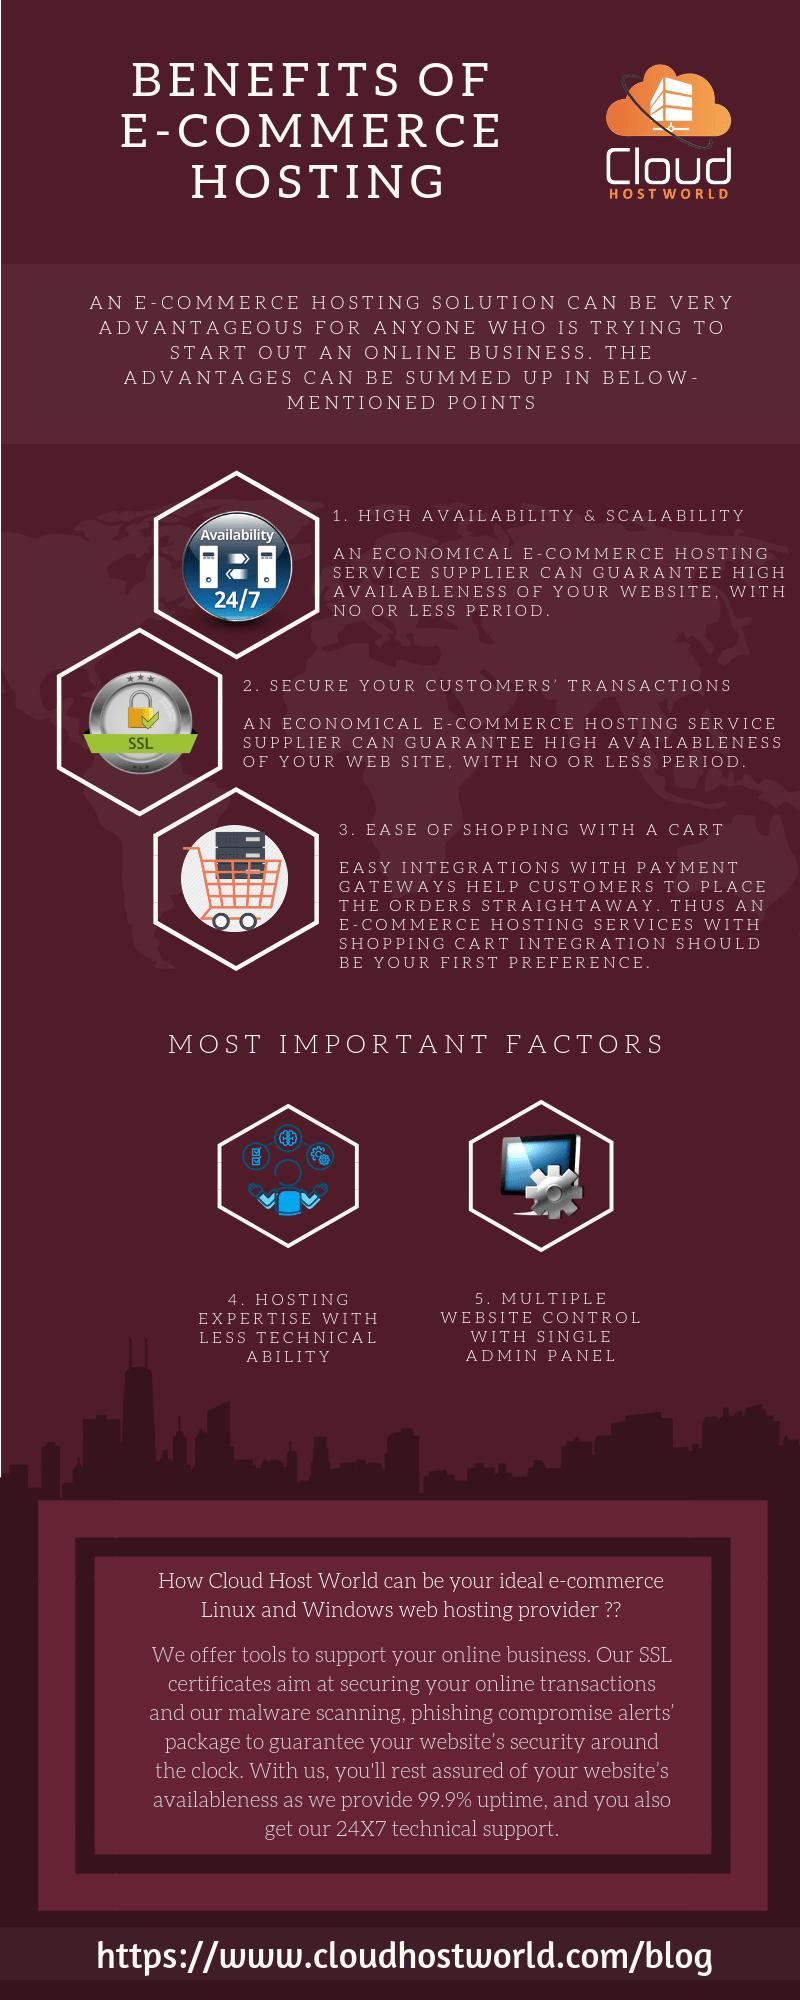 Benefits Of E-Commerce Hosting